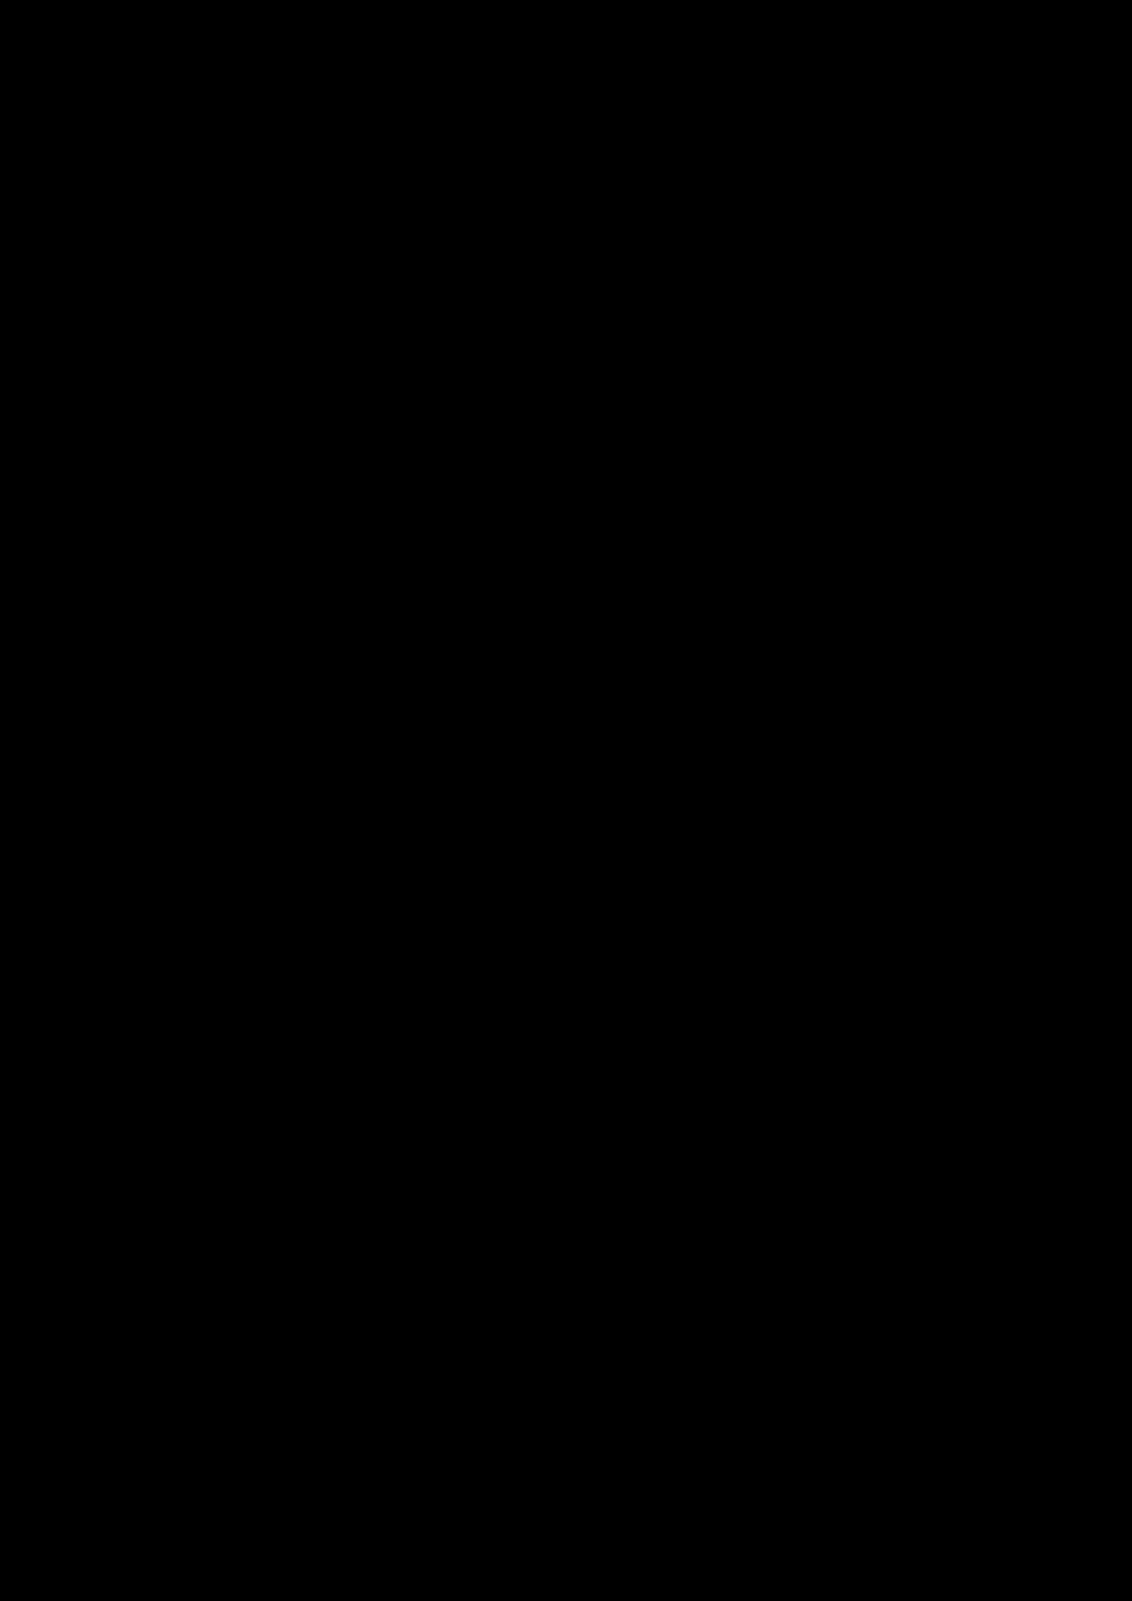 Mrs. Vandebilt slide, Image 15